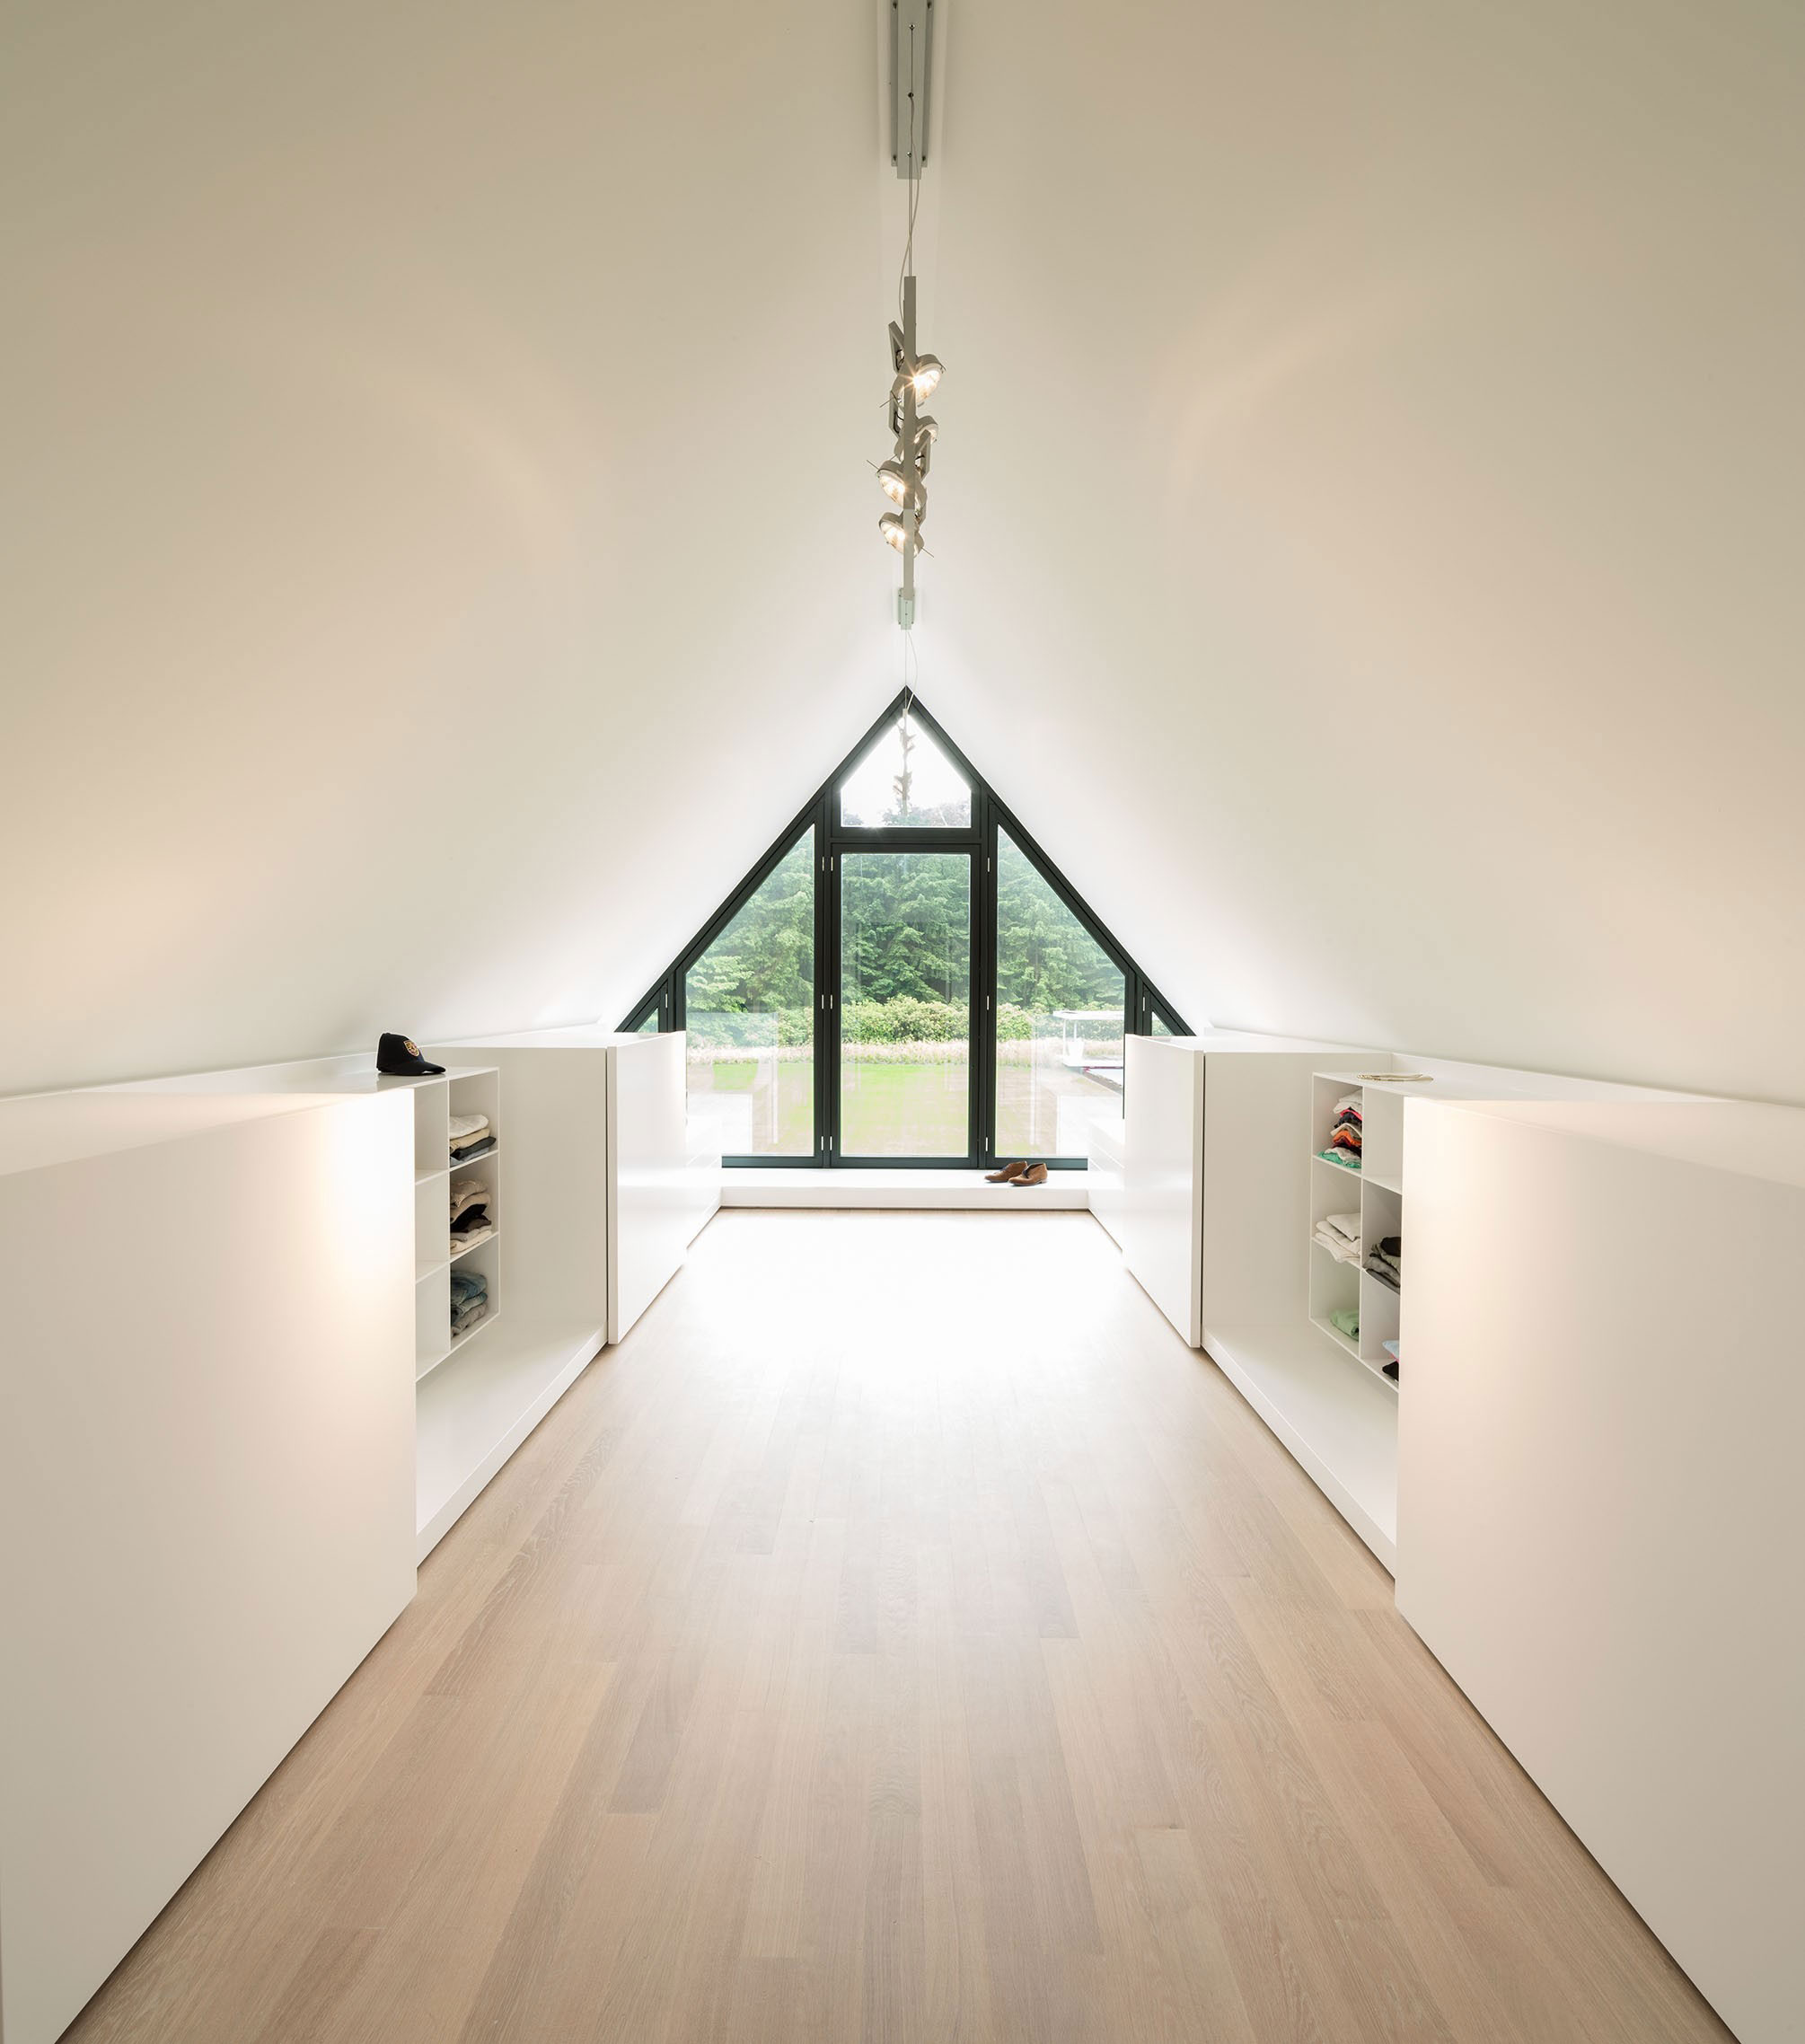 Modern Huizen Country House Located in a Quiet Rural Setting by De Brouwer Binnenwerk-22